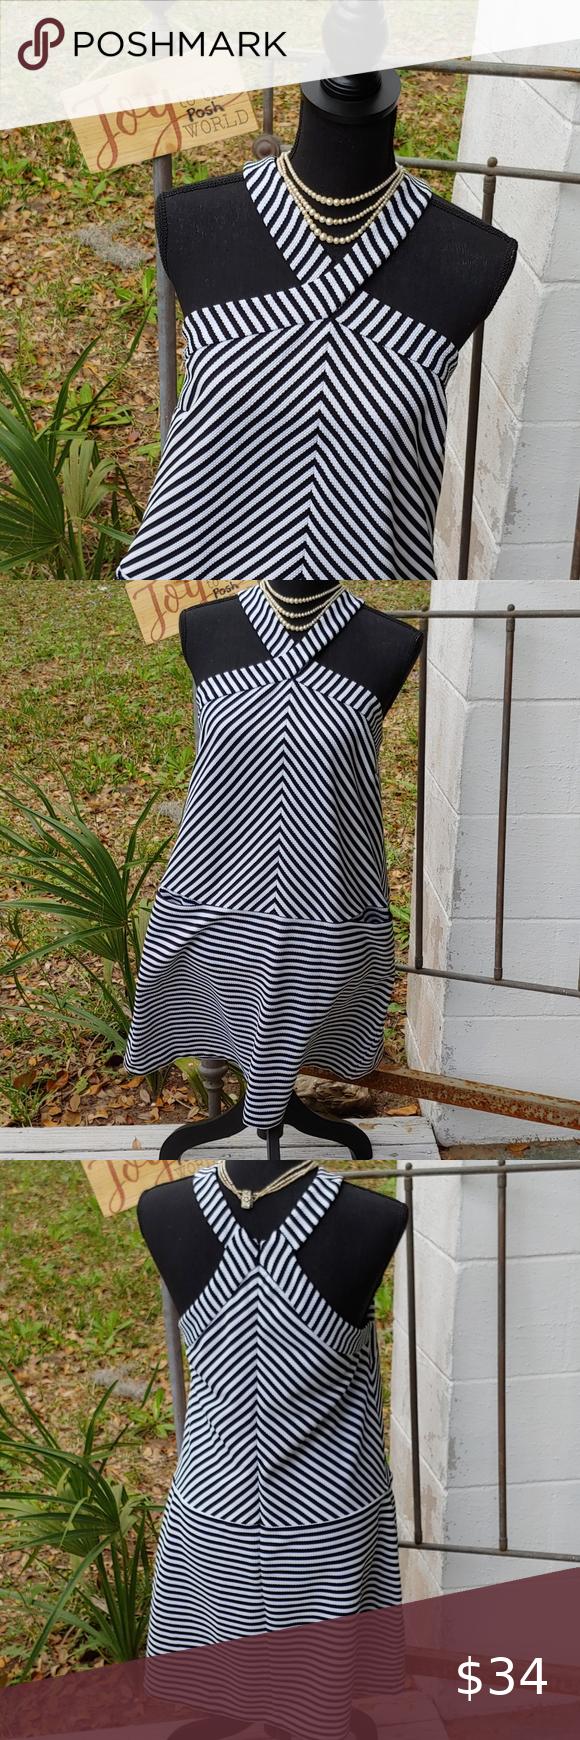 Kaari Blue Black White Striped Dress In 2021 Black White Striped Dress White Striped Dress Striped Dress [ 1740 x 580 Pixel ]